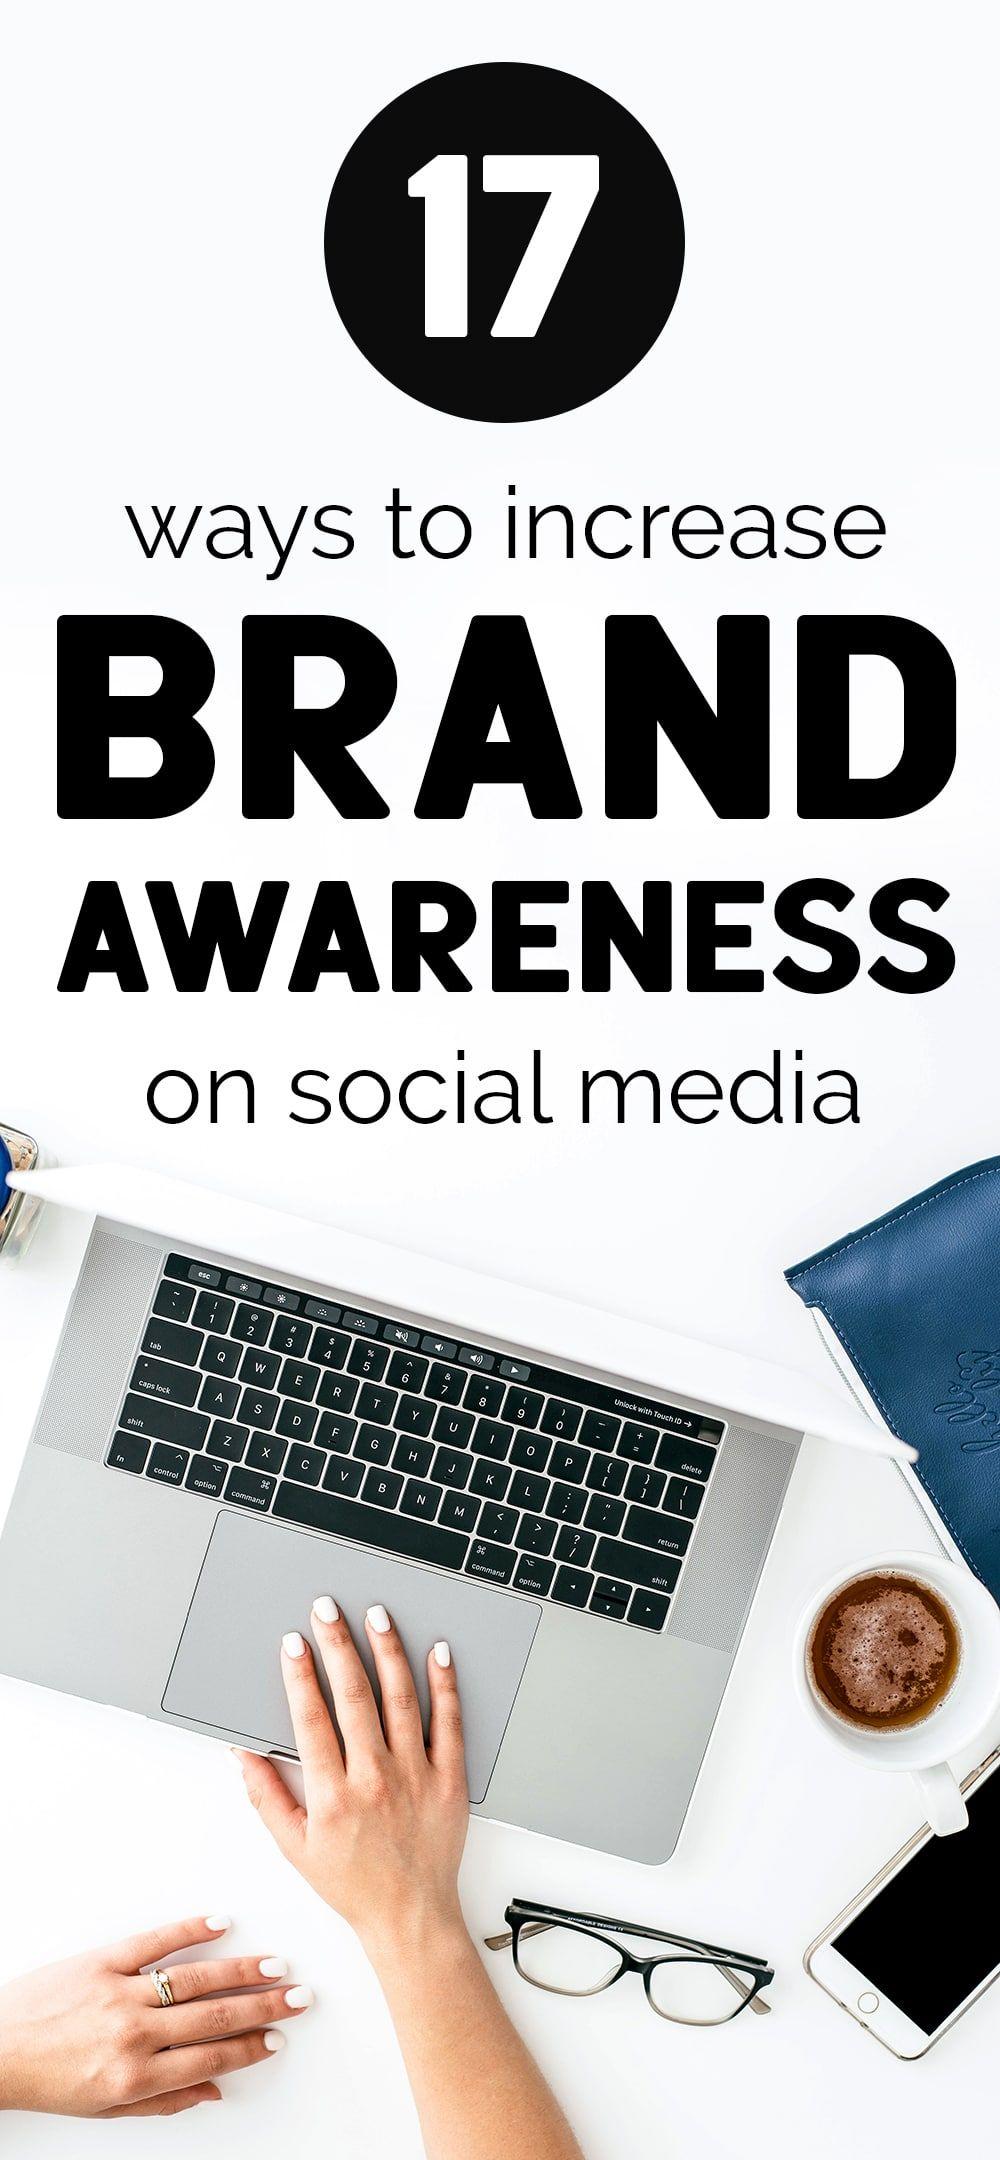 17 Ways To Increase Brand Awareness On Social Media In 2020 Brand Awareness Instagram Business Marketing Blog Social Media